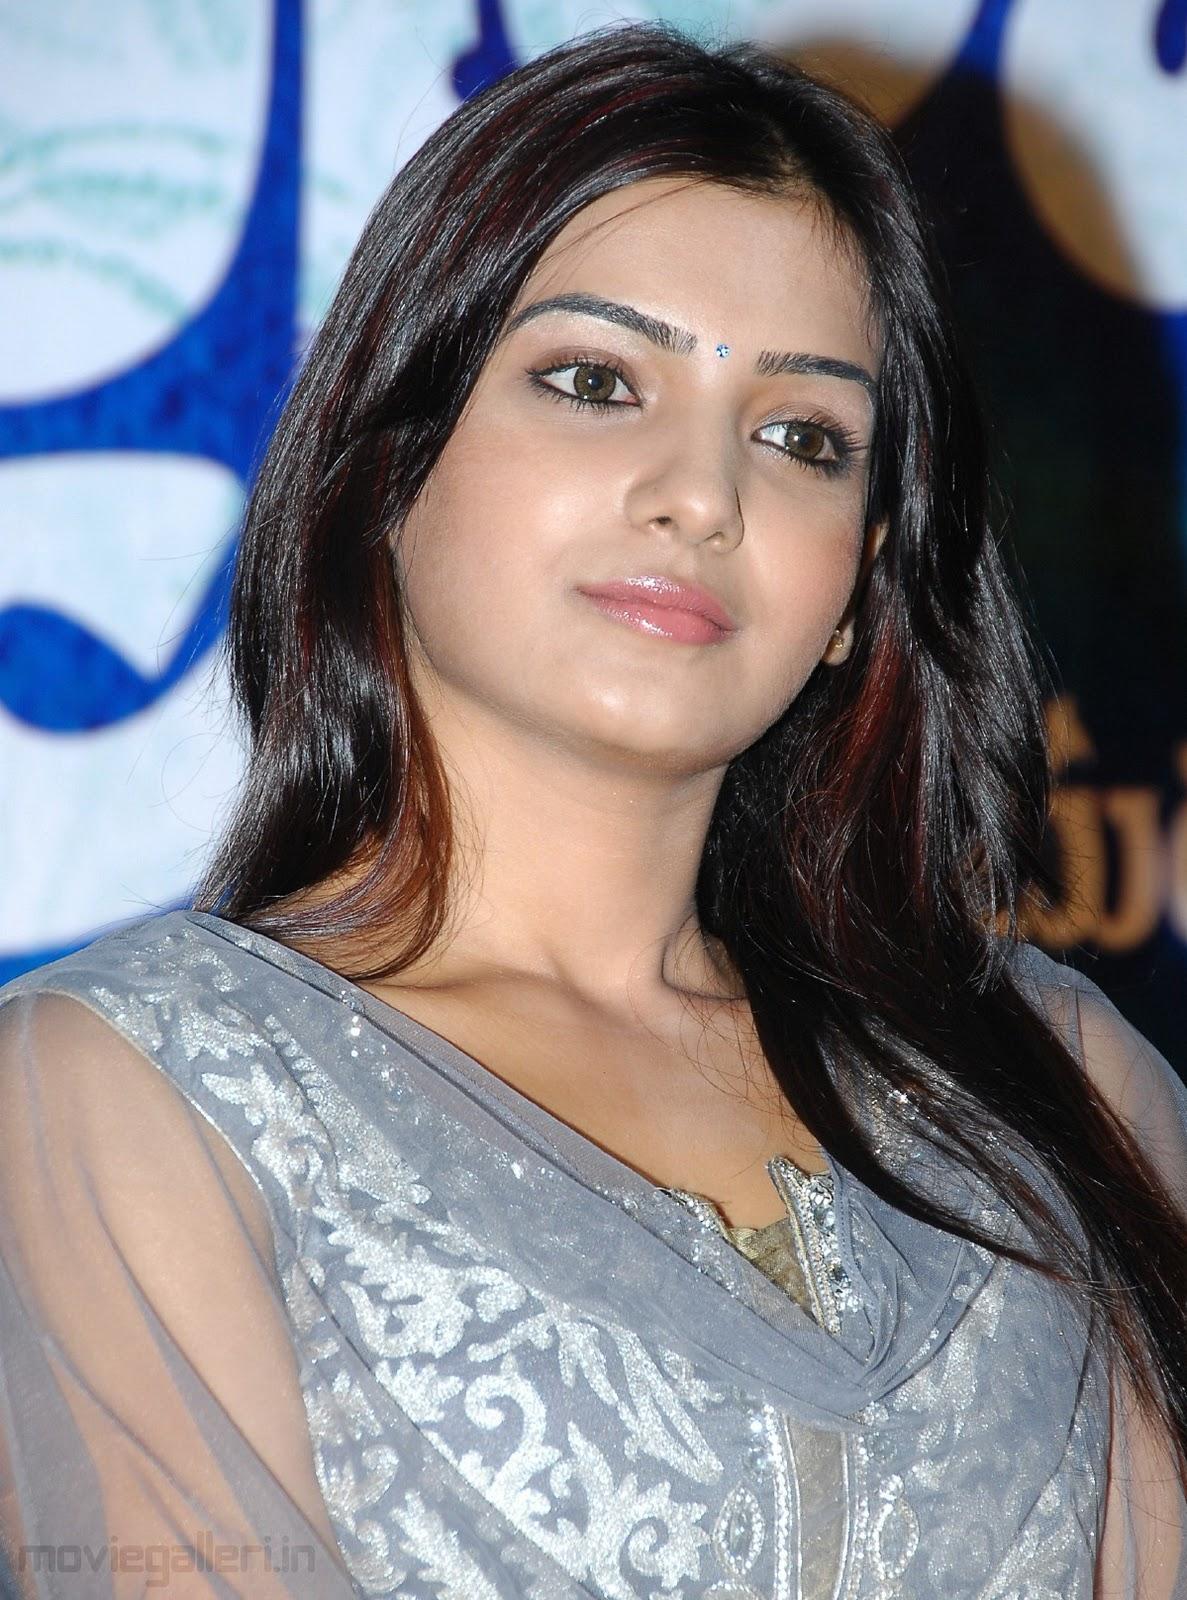 South Indian Hot N Beautiful Actress - HD Wallpaper